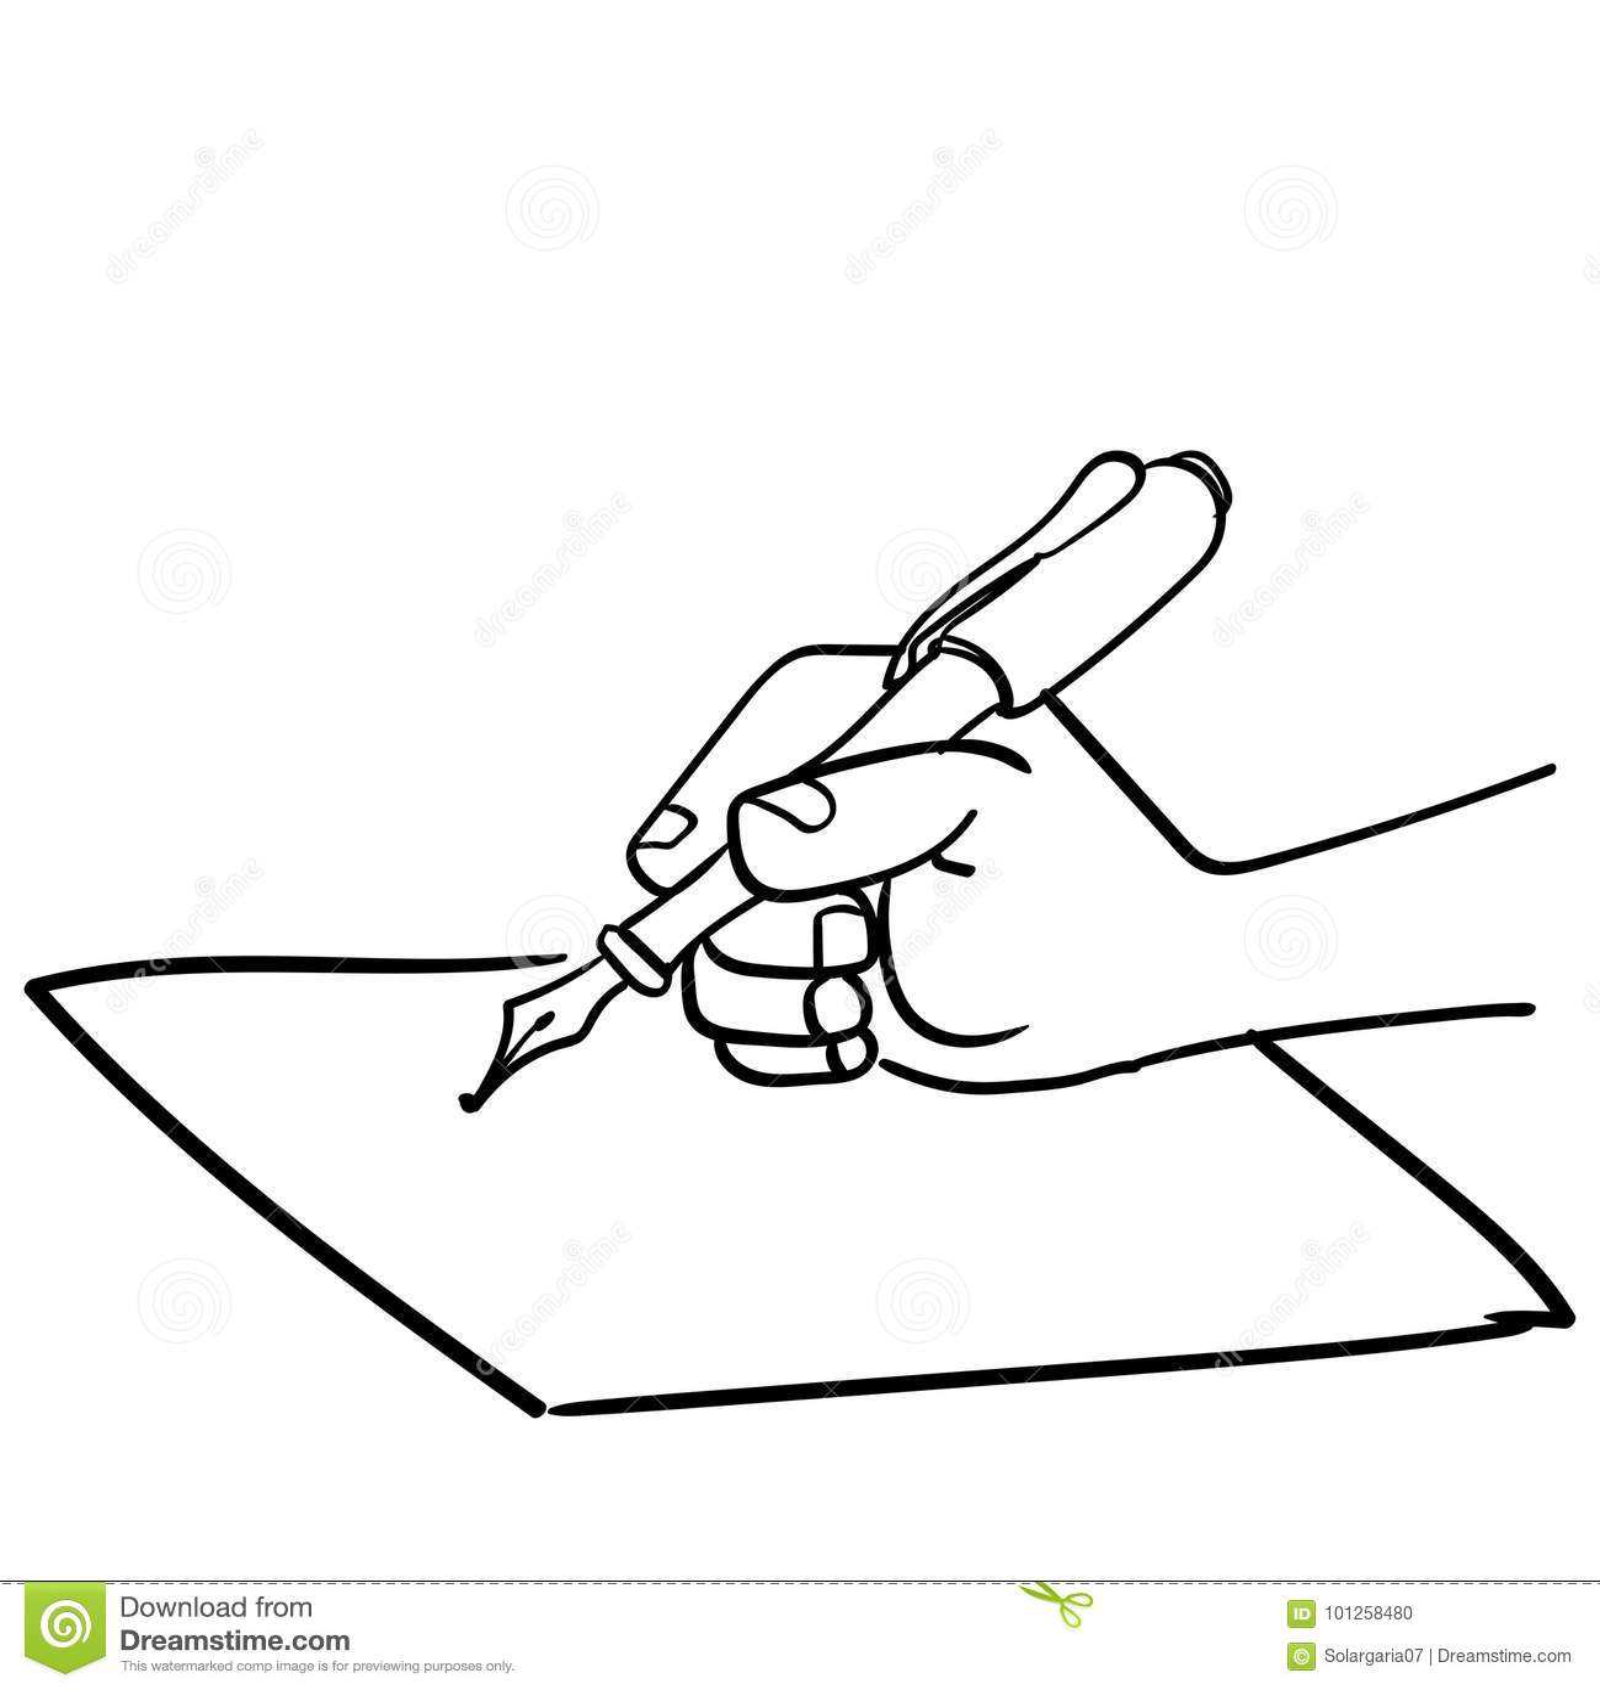 Cartoon Hand Writing With Pen-Vector Drawn Stock Vector